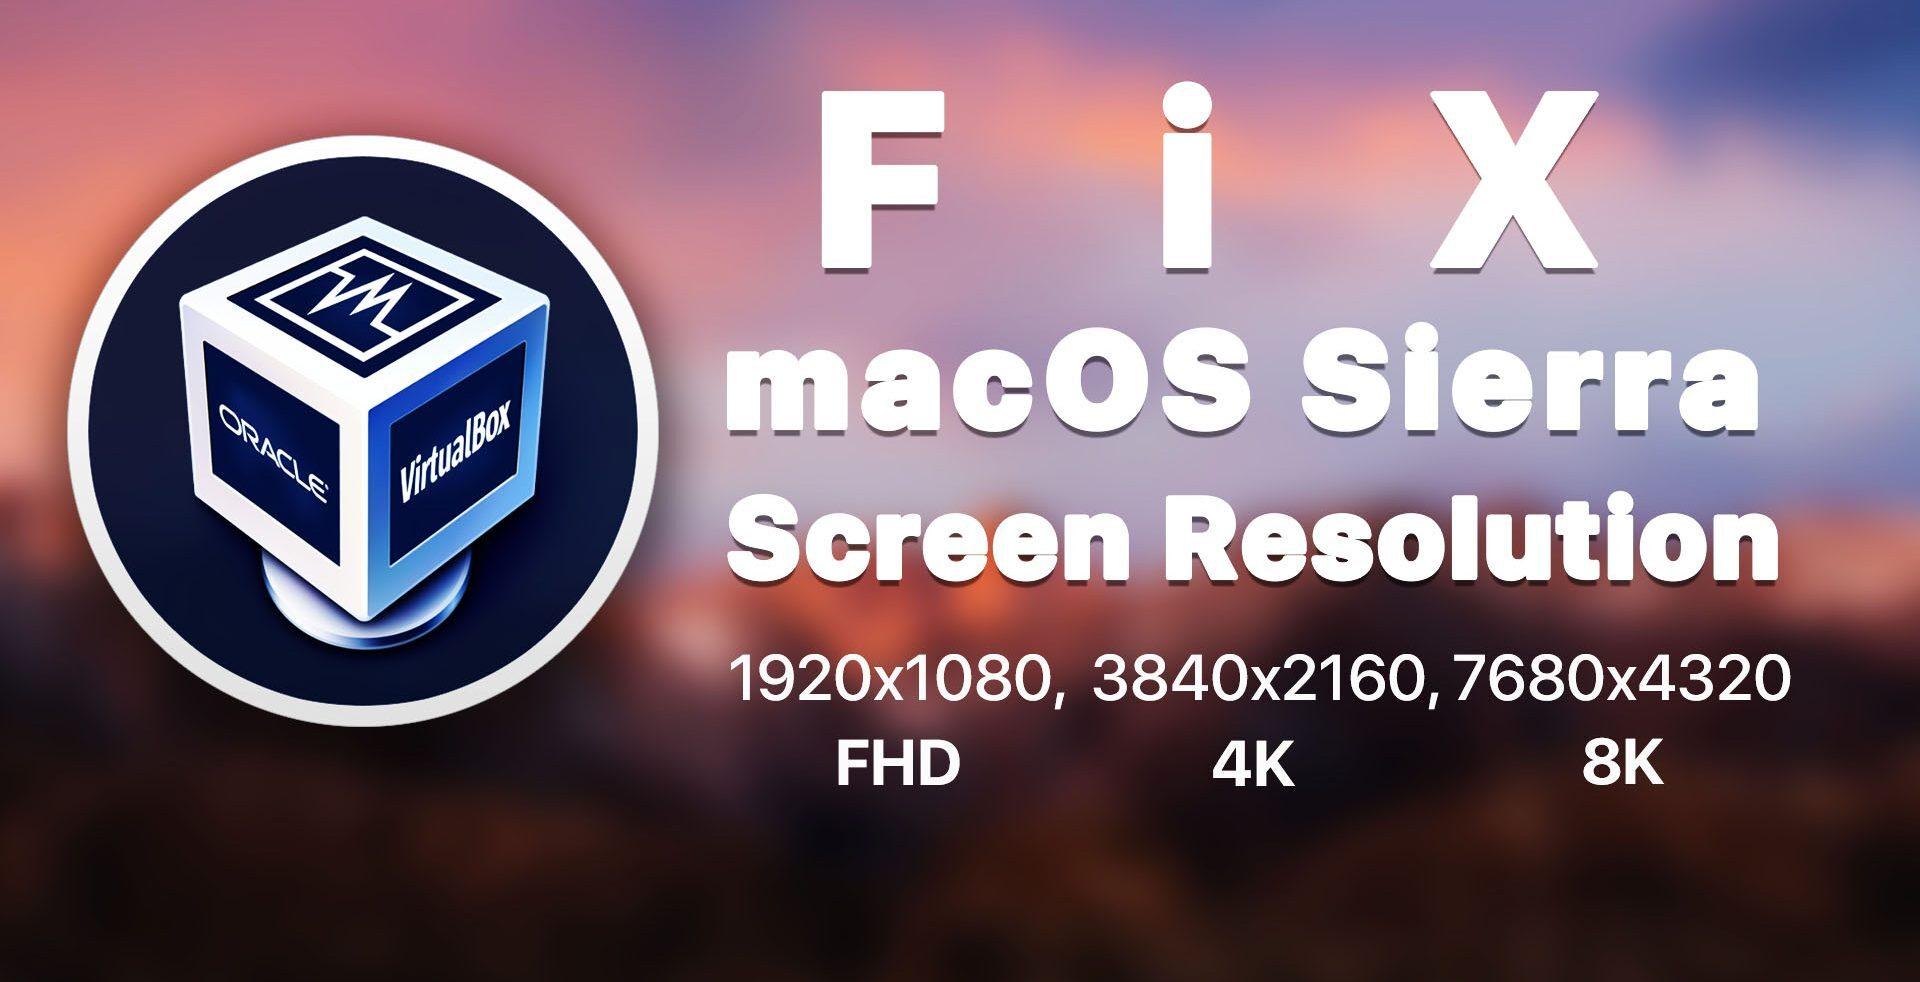 How to Fix macOS Sierra Screen Resolution on VirtualBox